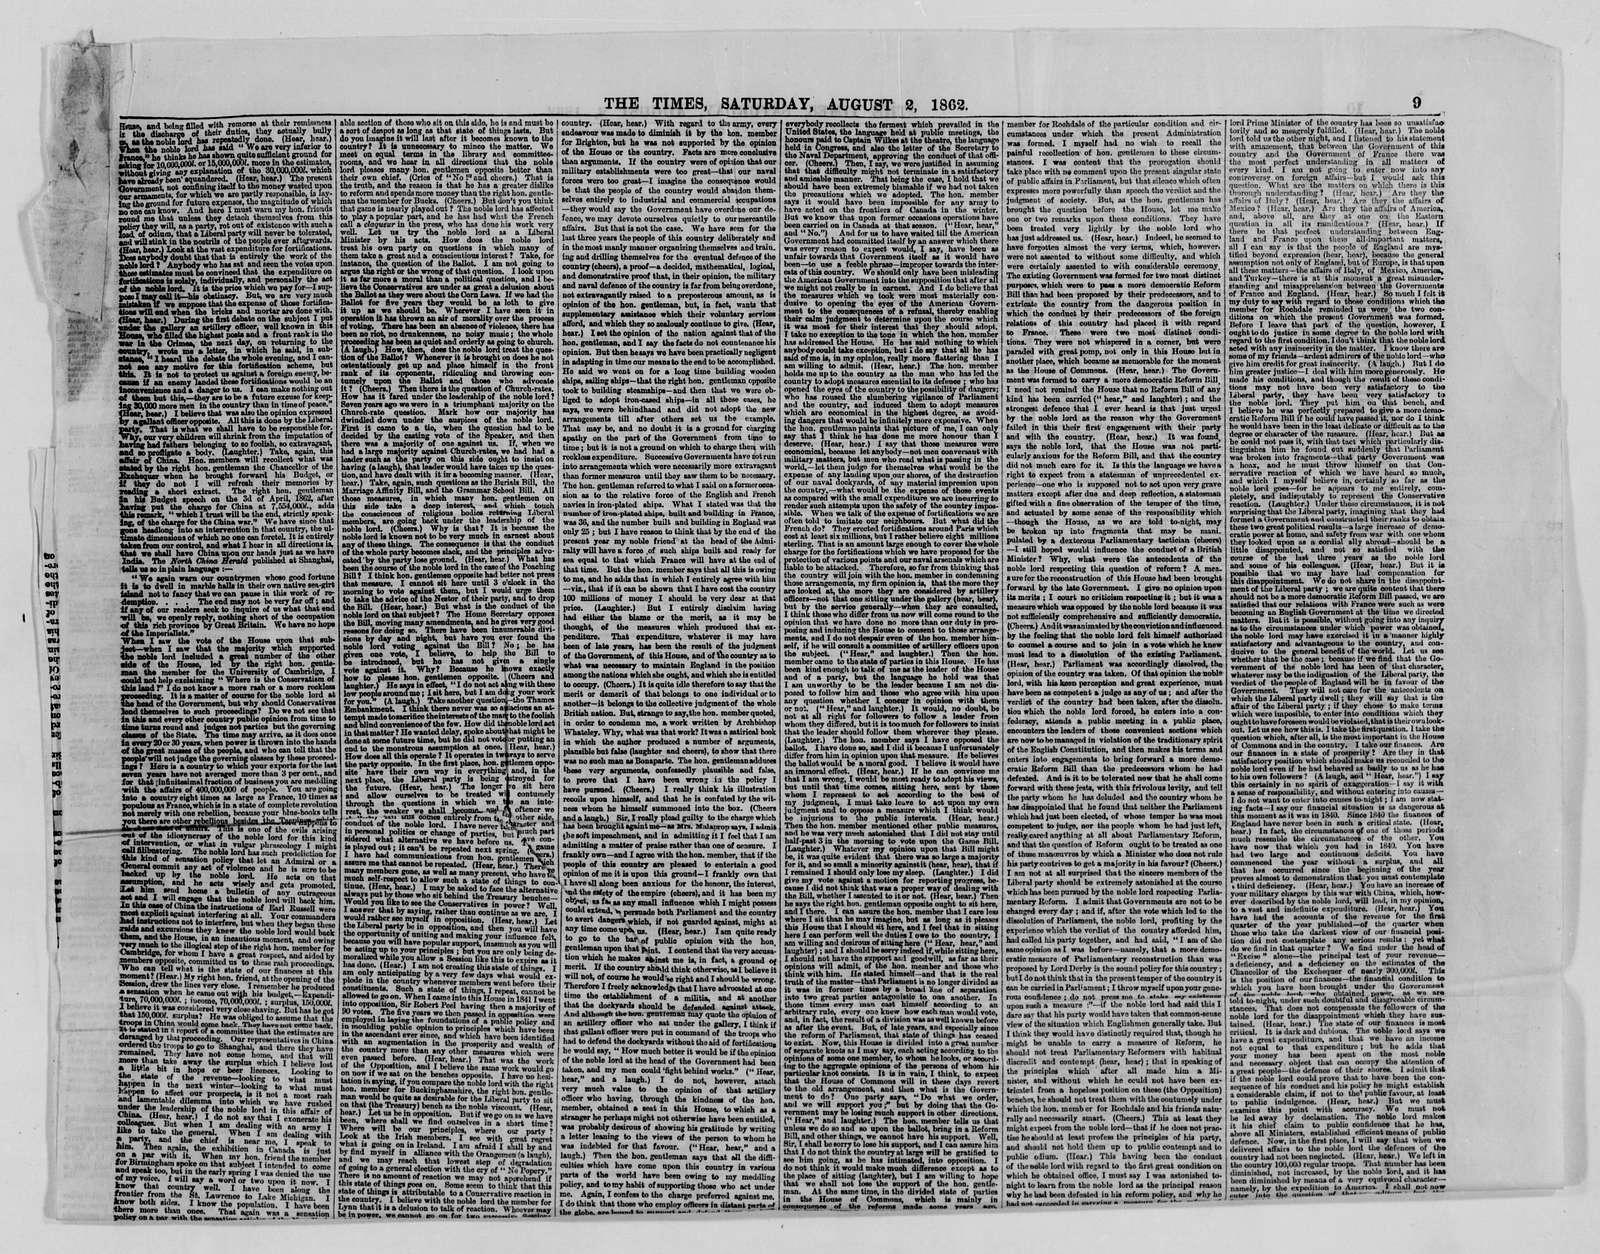 Confederate States of America records: Microfilm Reel 28